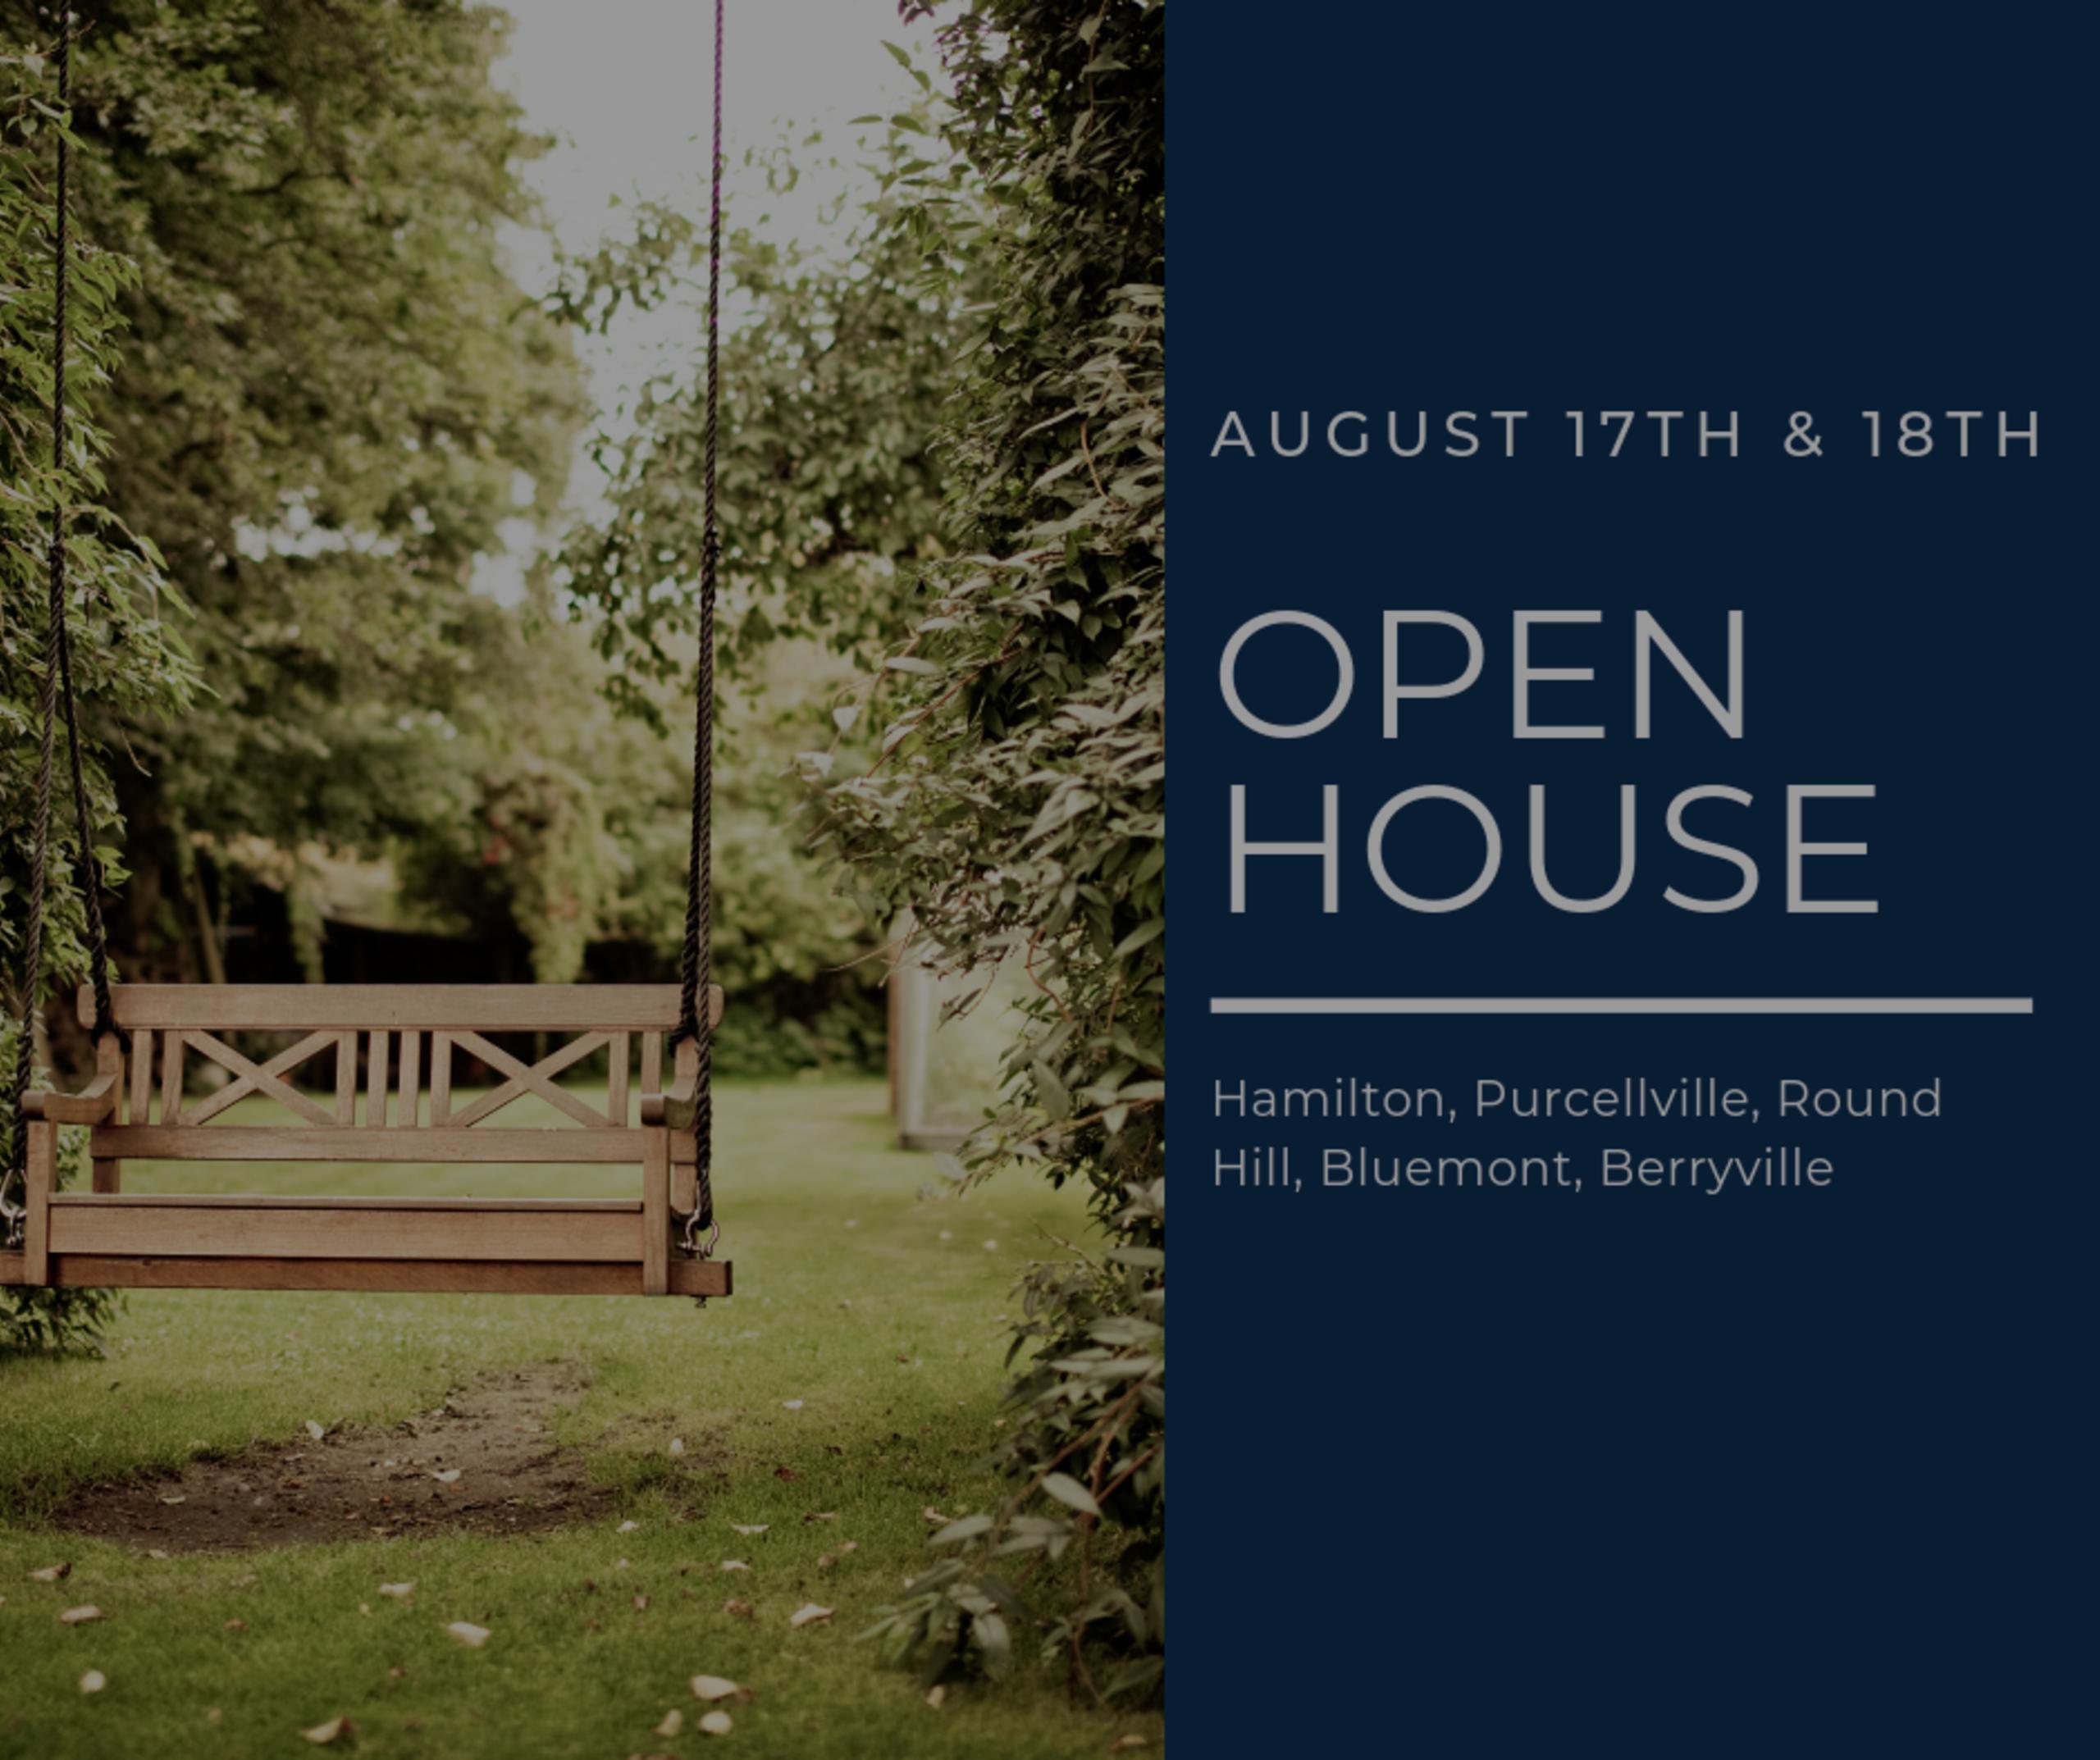 Open House List 8/17/19 – 8/18/19